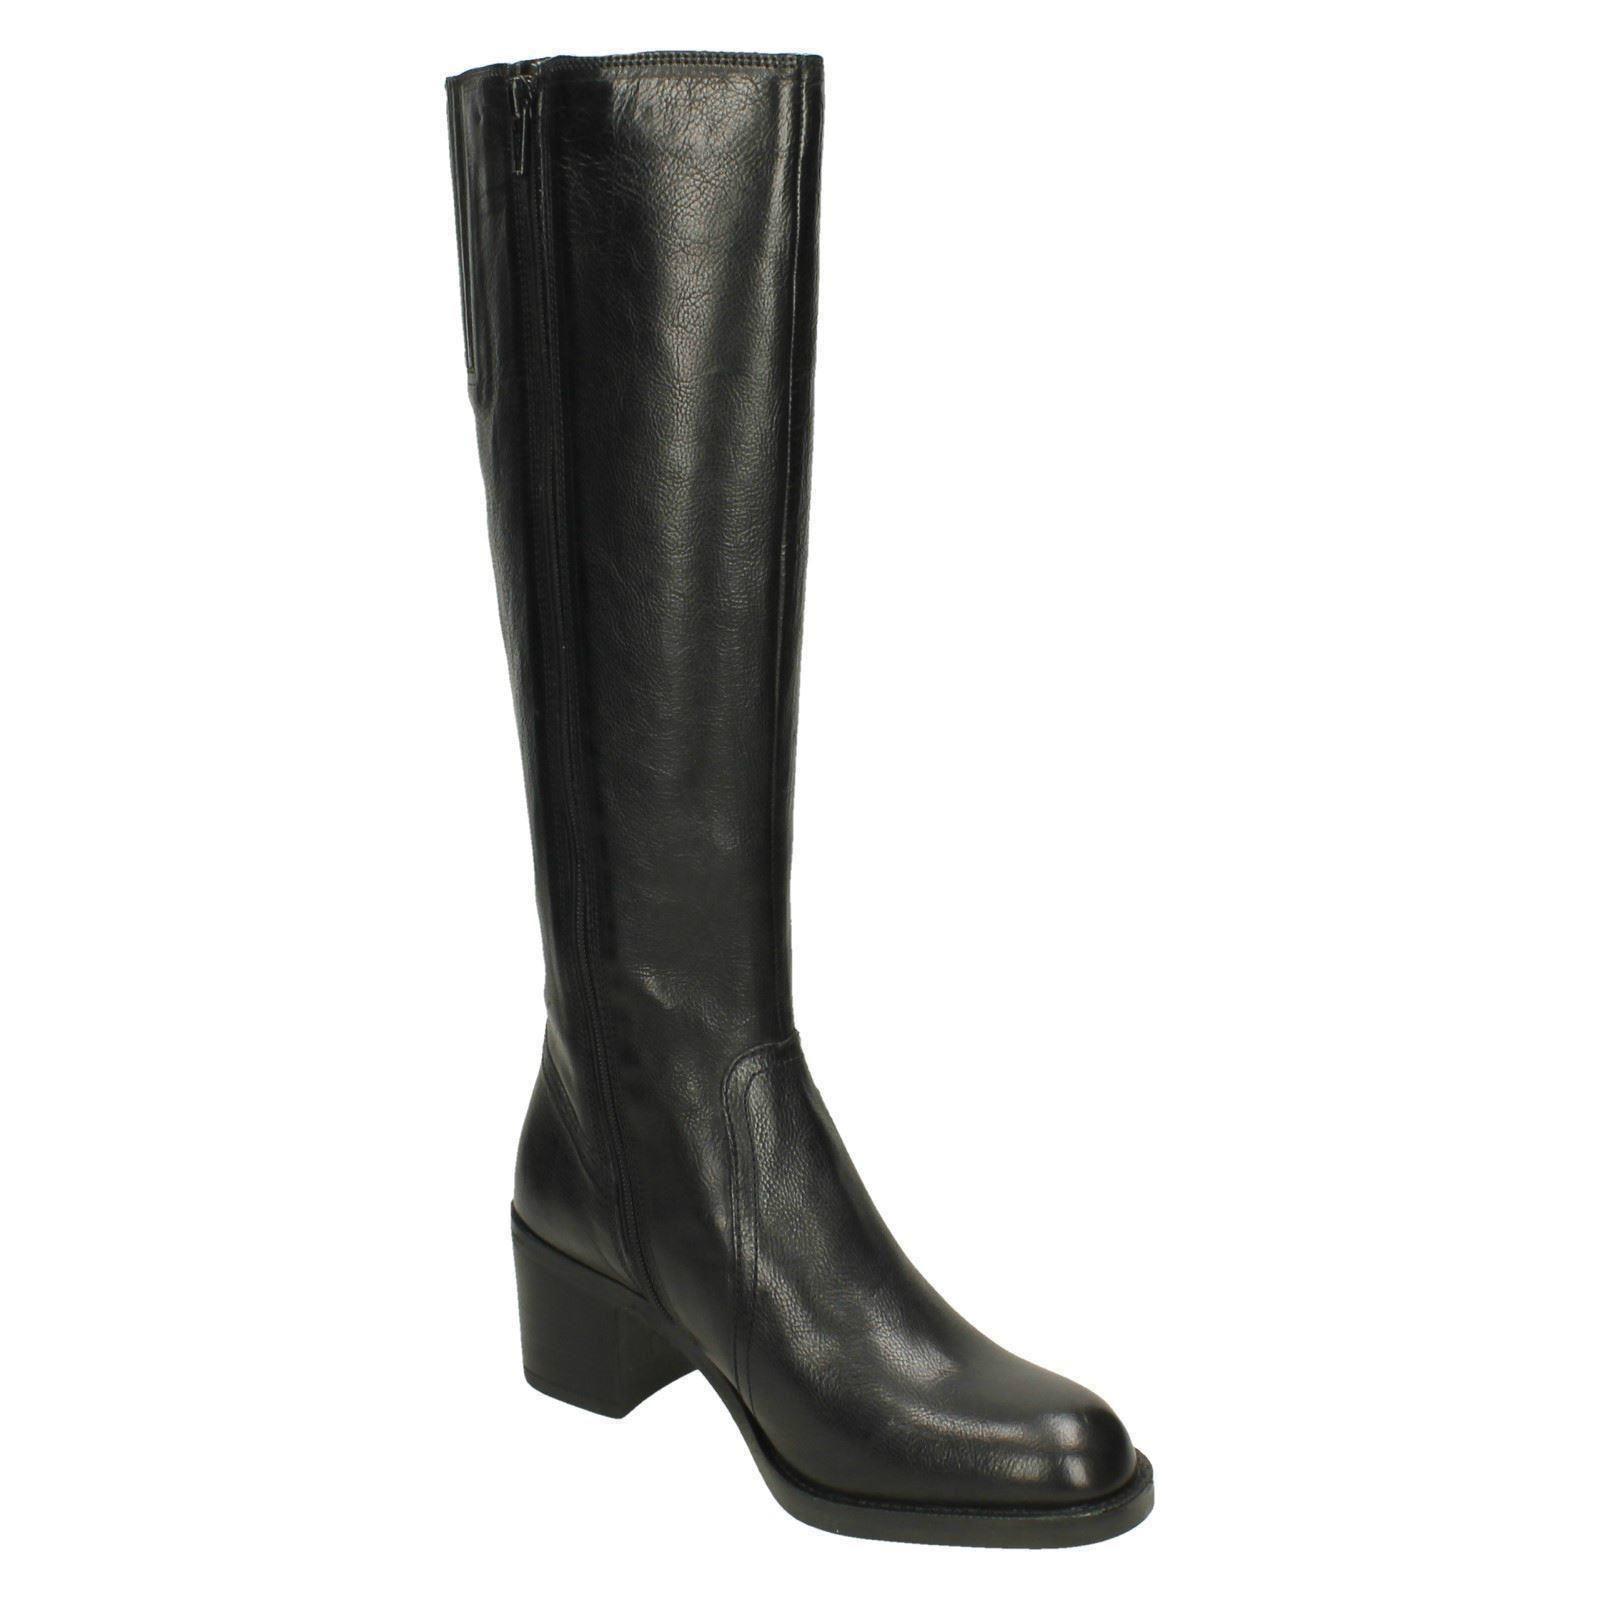 Ladies Clarks Stylish Heeled Heeled Heeled Knee High Boots Mascarpone Ela 6ee627